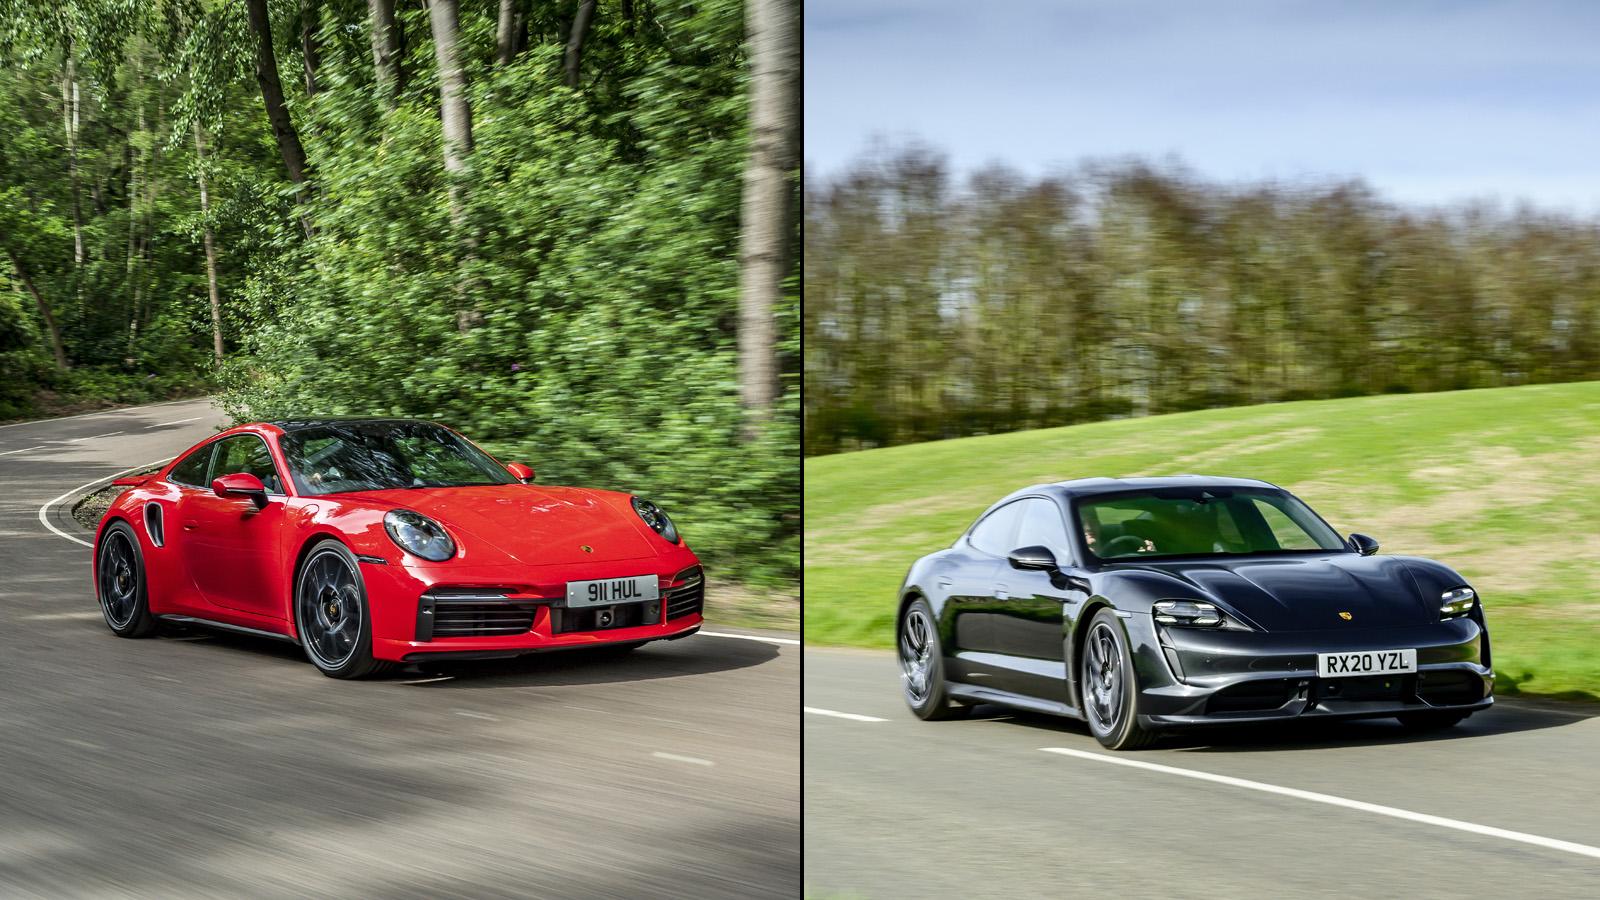 2021 Porsche 911 Turbo S Vs 2020 Porsche Taycan Turbo Performance 0 60 Driving Impressions Autoblog